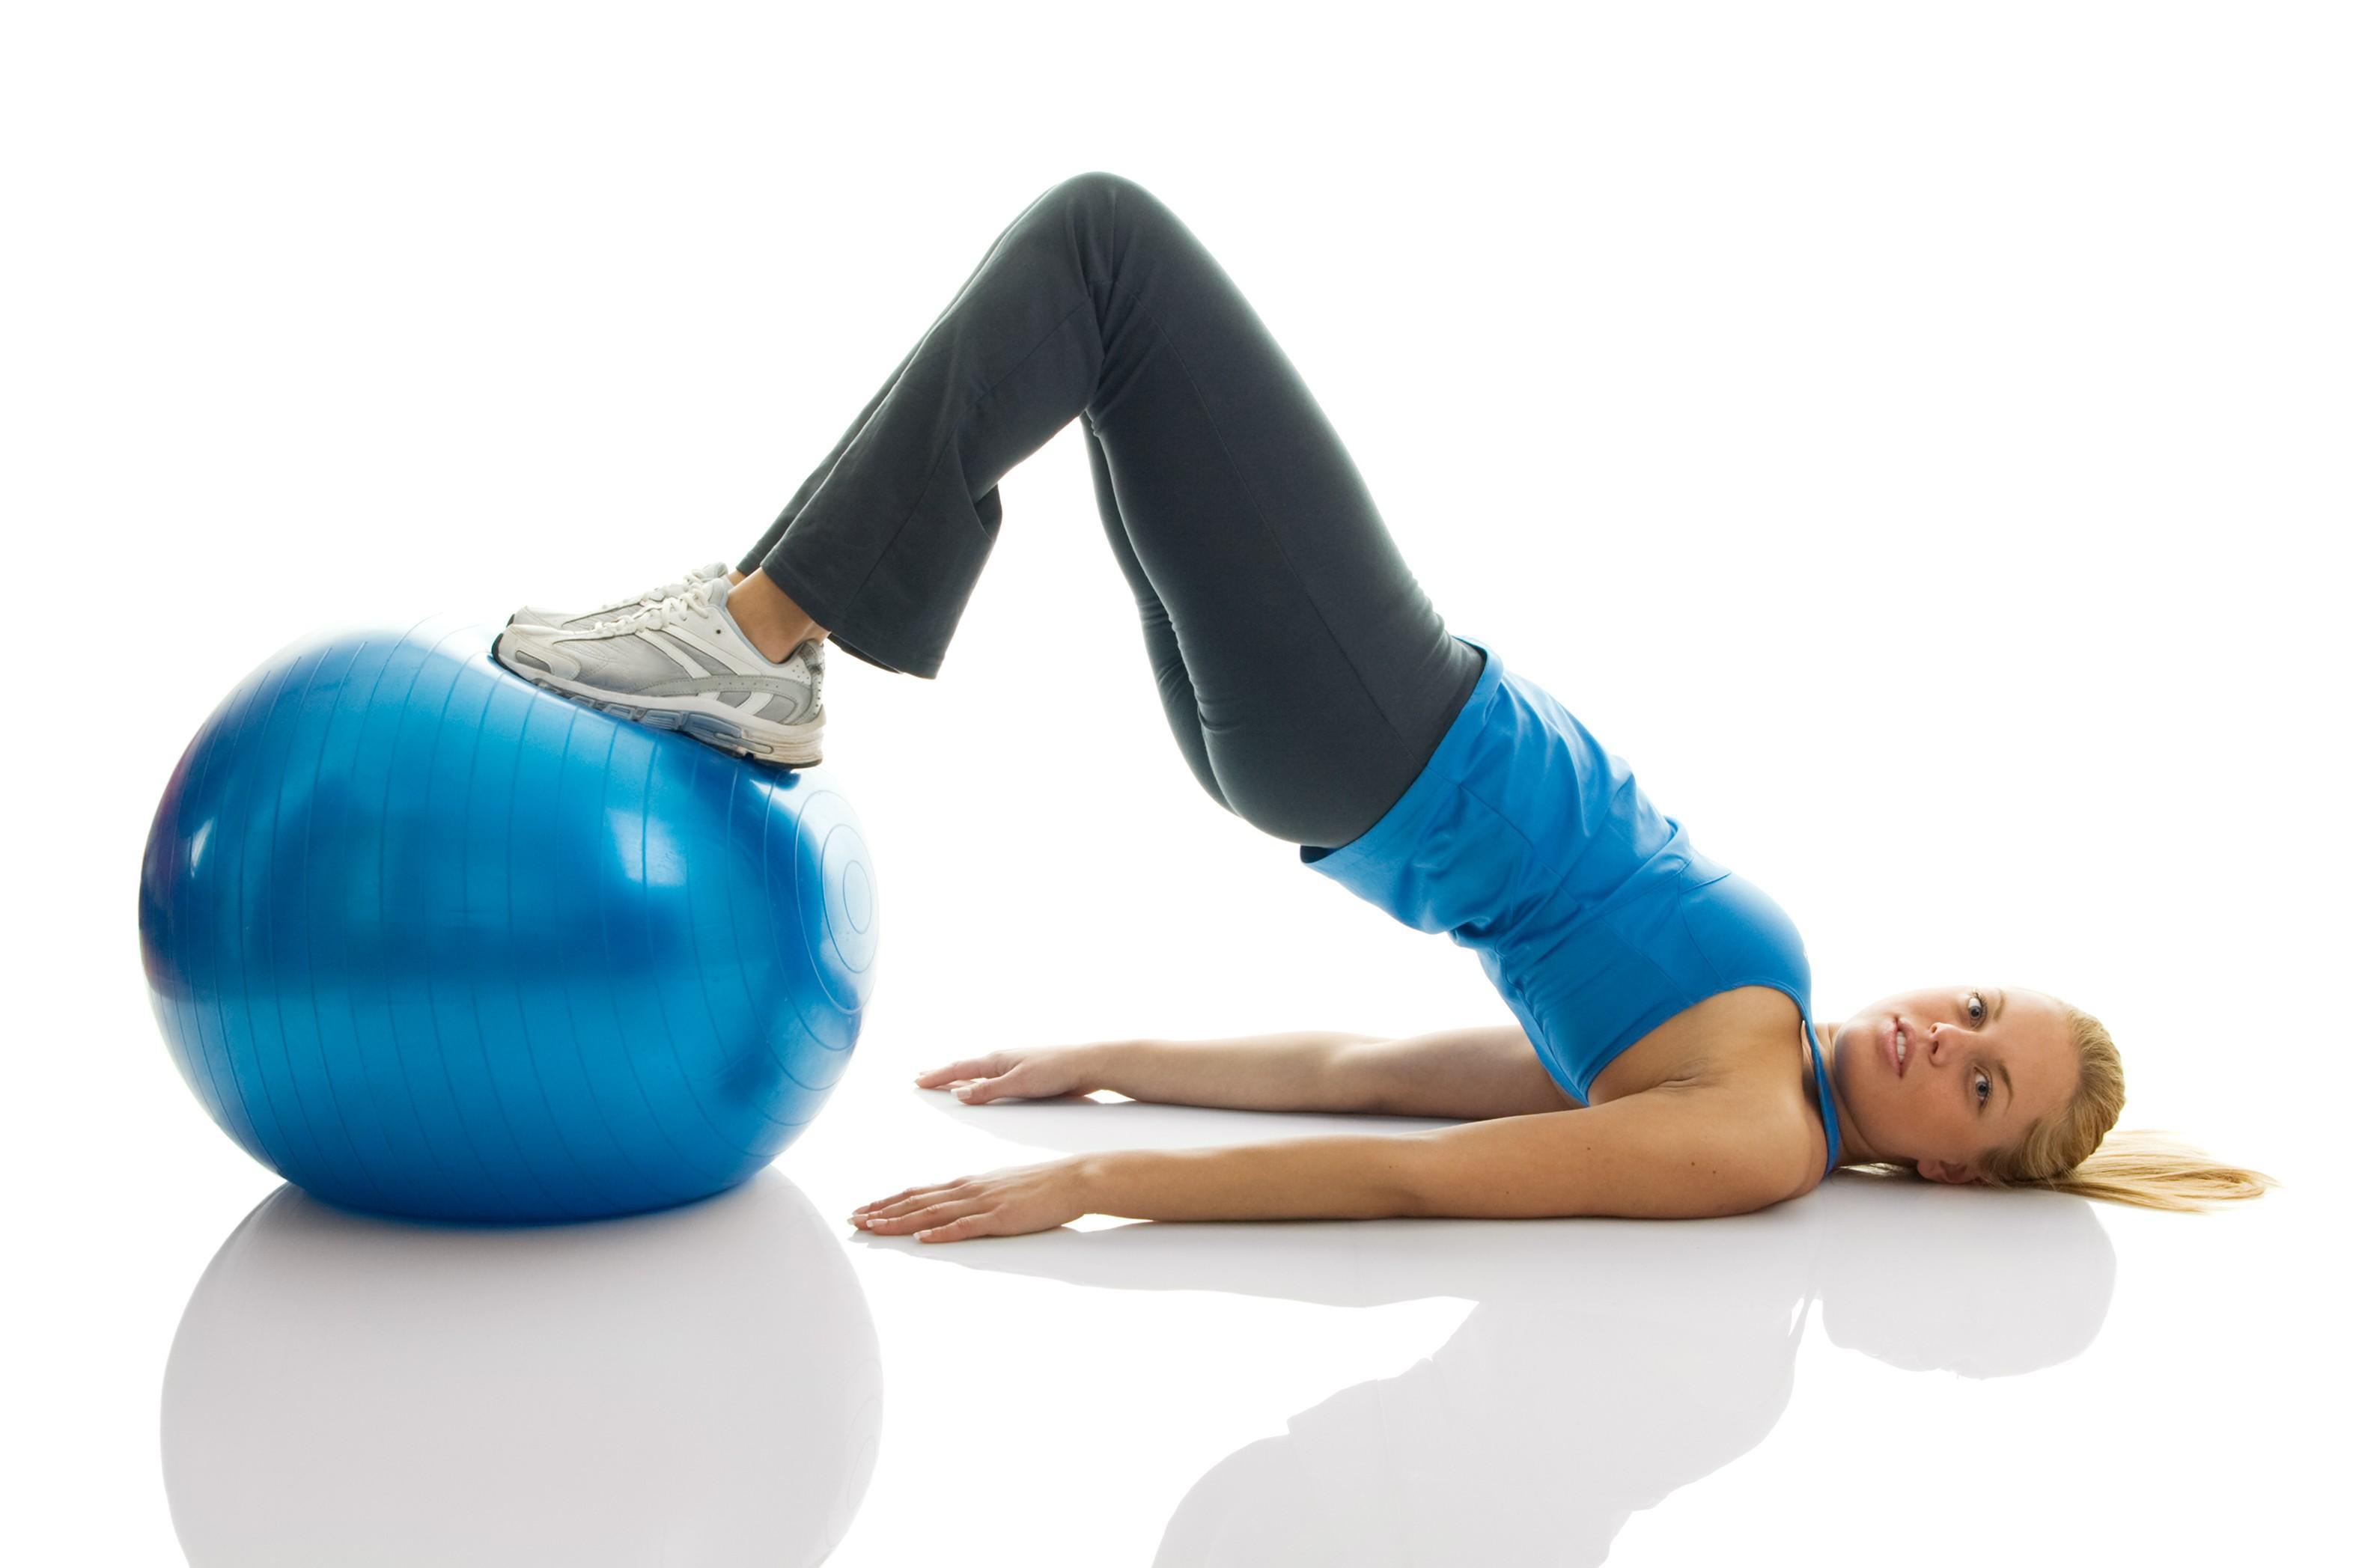 Clases de Yoga, Tai Chi, Pilates en Pontevedra